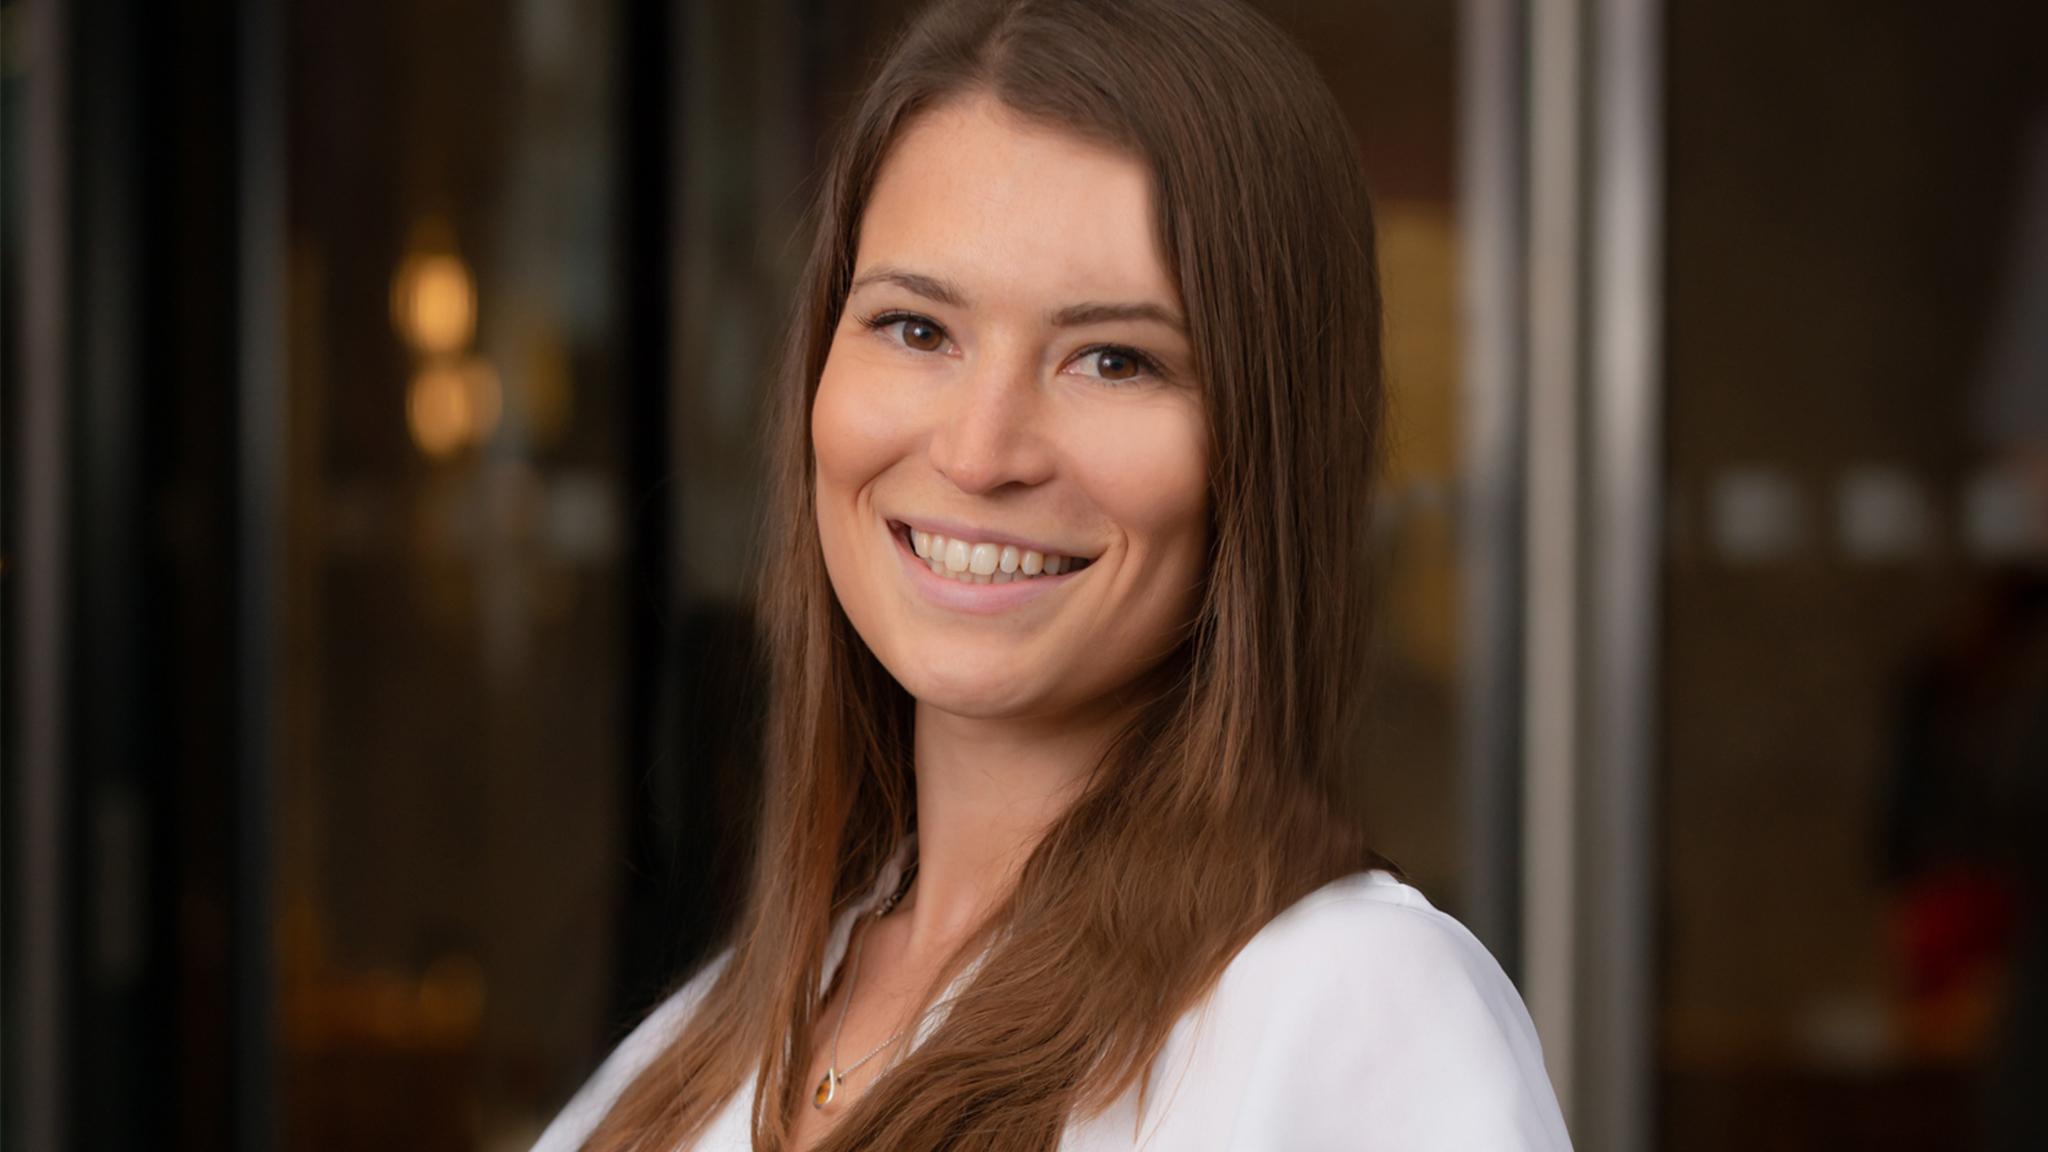 Five minutes with… Amy Petrikova, principal planner, Nexus Planning